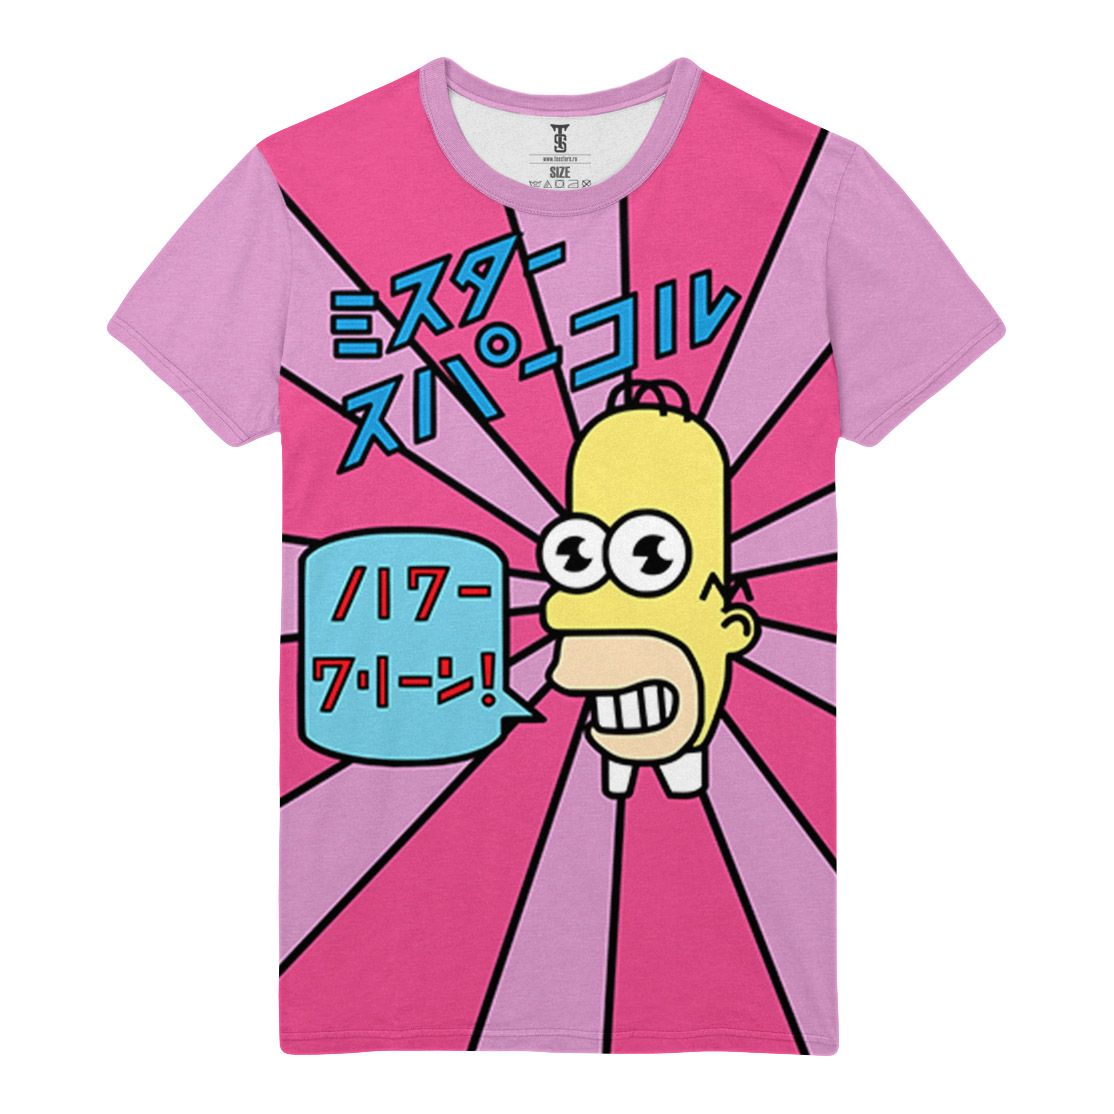 2ac38401d3a5a0 awesome T-shirt Mr Sparkle Homer Simpson The Simpsons Cartoon Loot Merch -   amazon  Apparels  australia  boy  buy  ebay  Female  girls  india  kids   loot ...